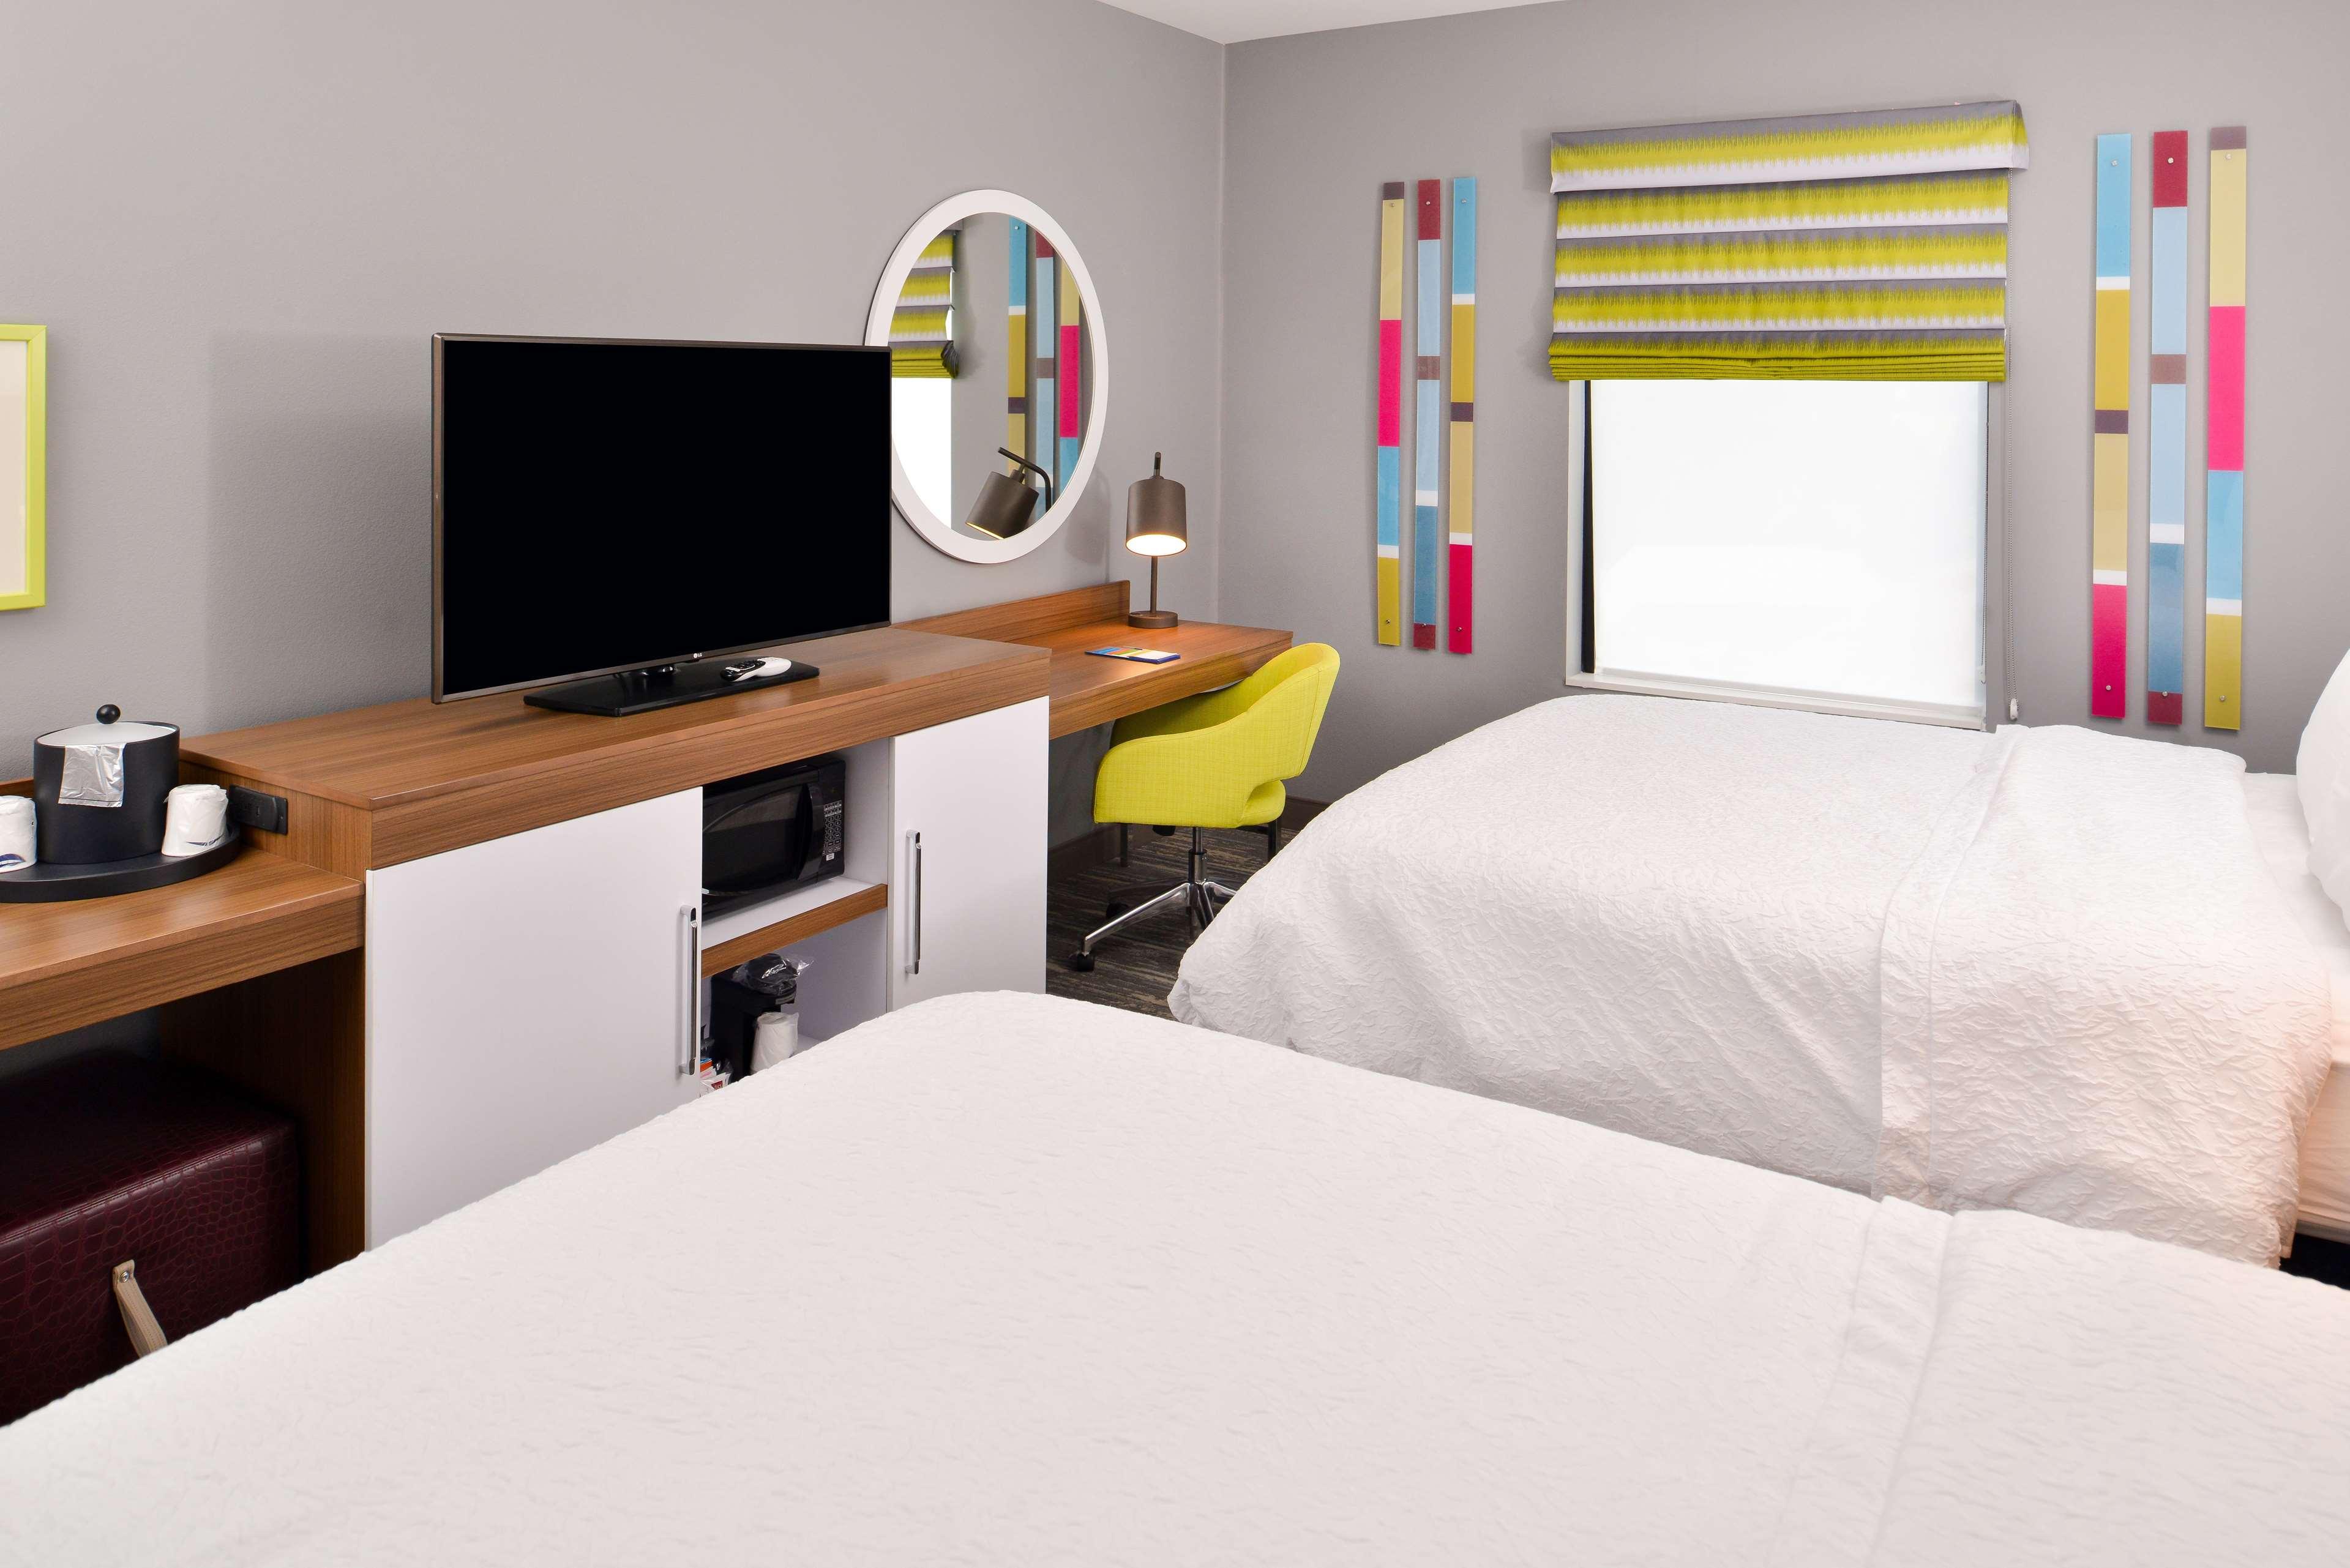 Hampton Inn & Suites St. Paul Oakdale/Woodbury image 30